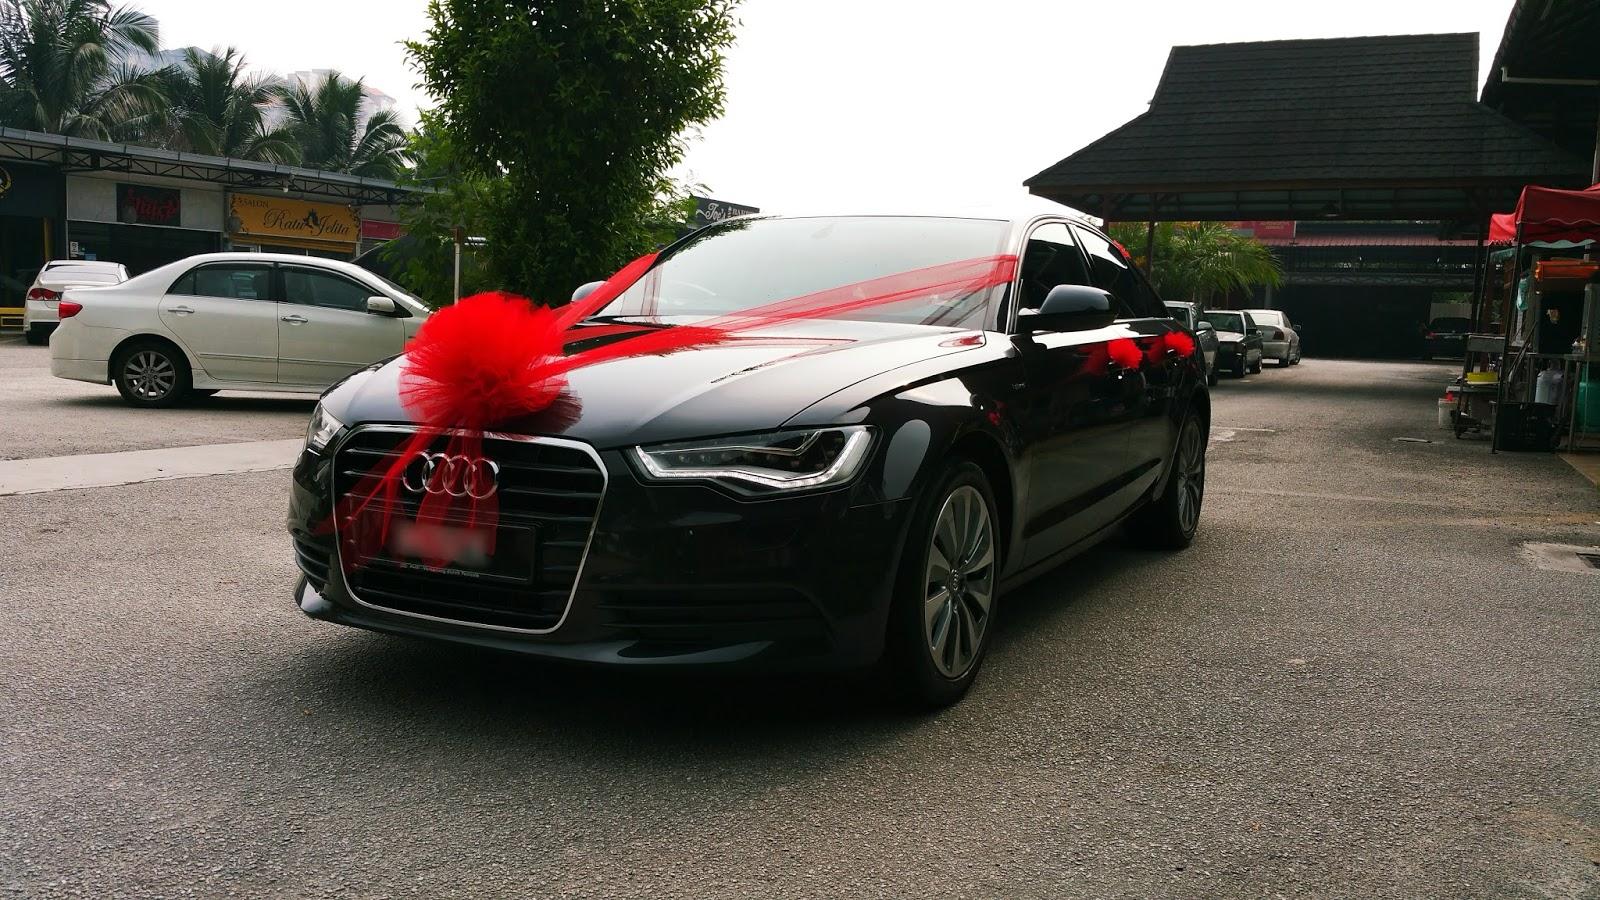 RedOrca Malaysia Wedding and Event Car Rental: Audi a6 ...